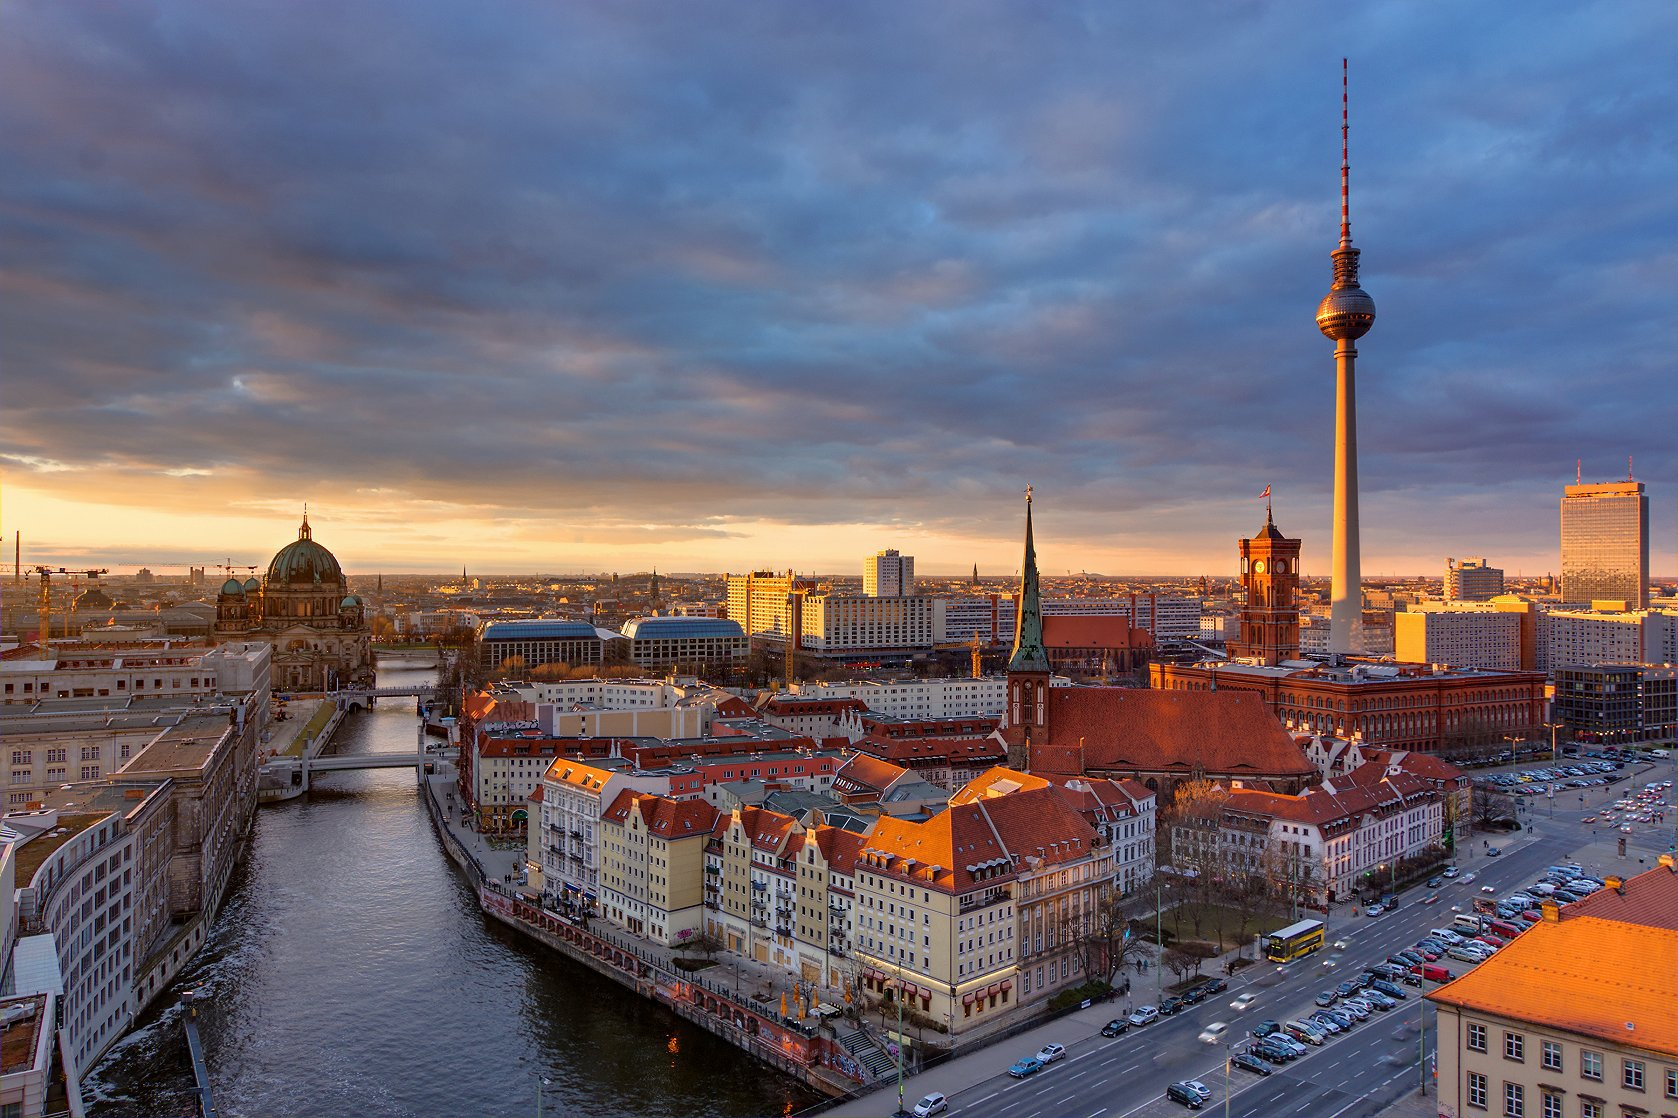 柏林电视塔  Berliner Fernsehturm   -1